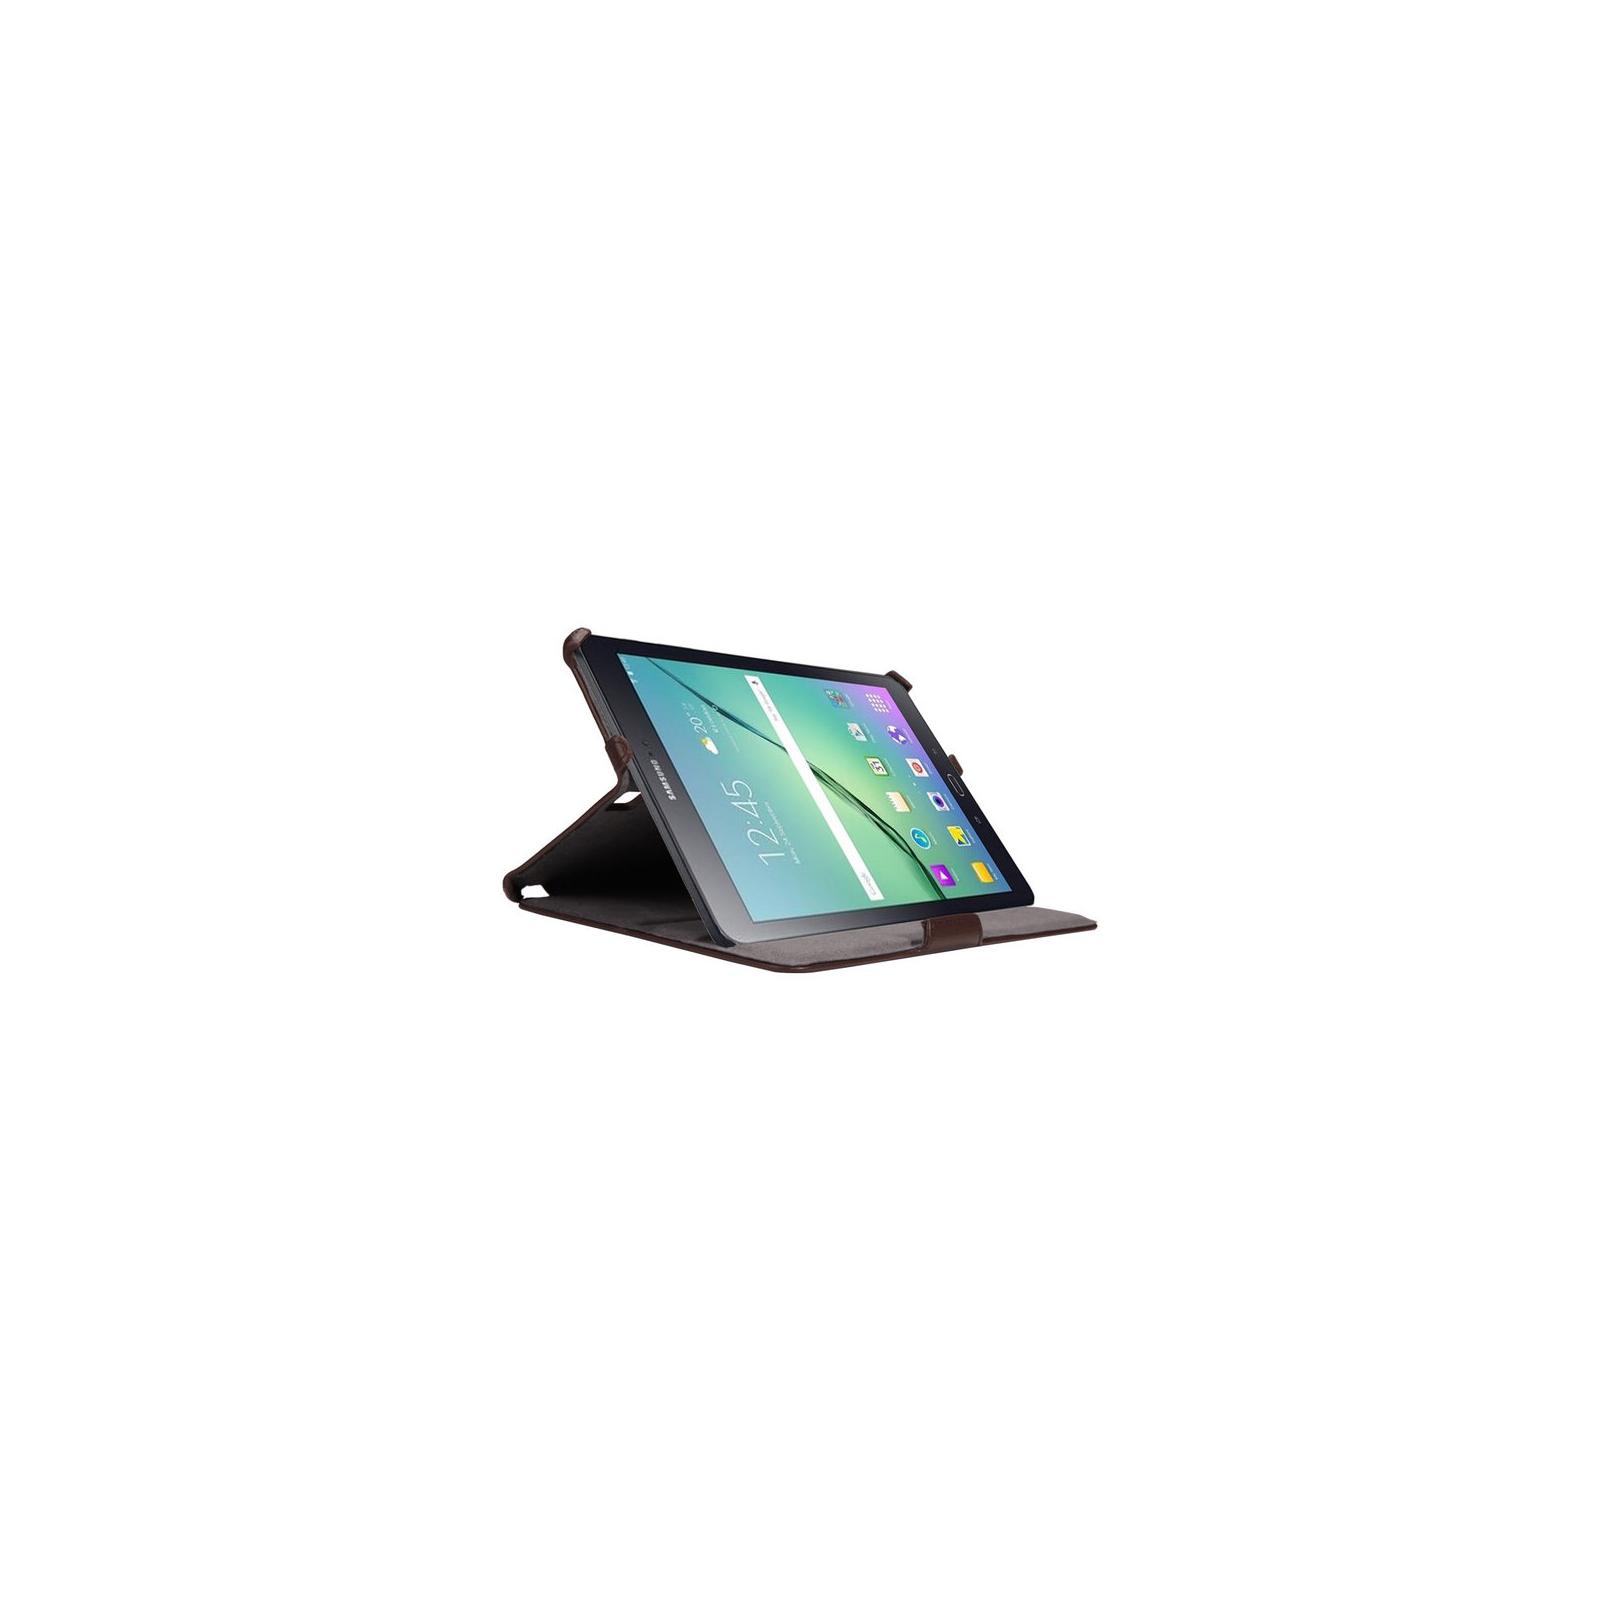 Чехол для планшета AirOn для Samsung Galaxy Tab S 2 8.0 brown (4822352778521) изображение 6